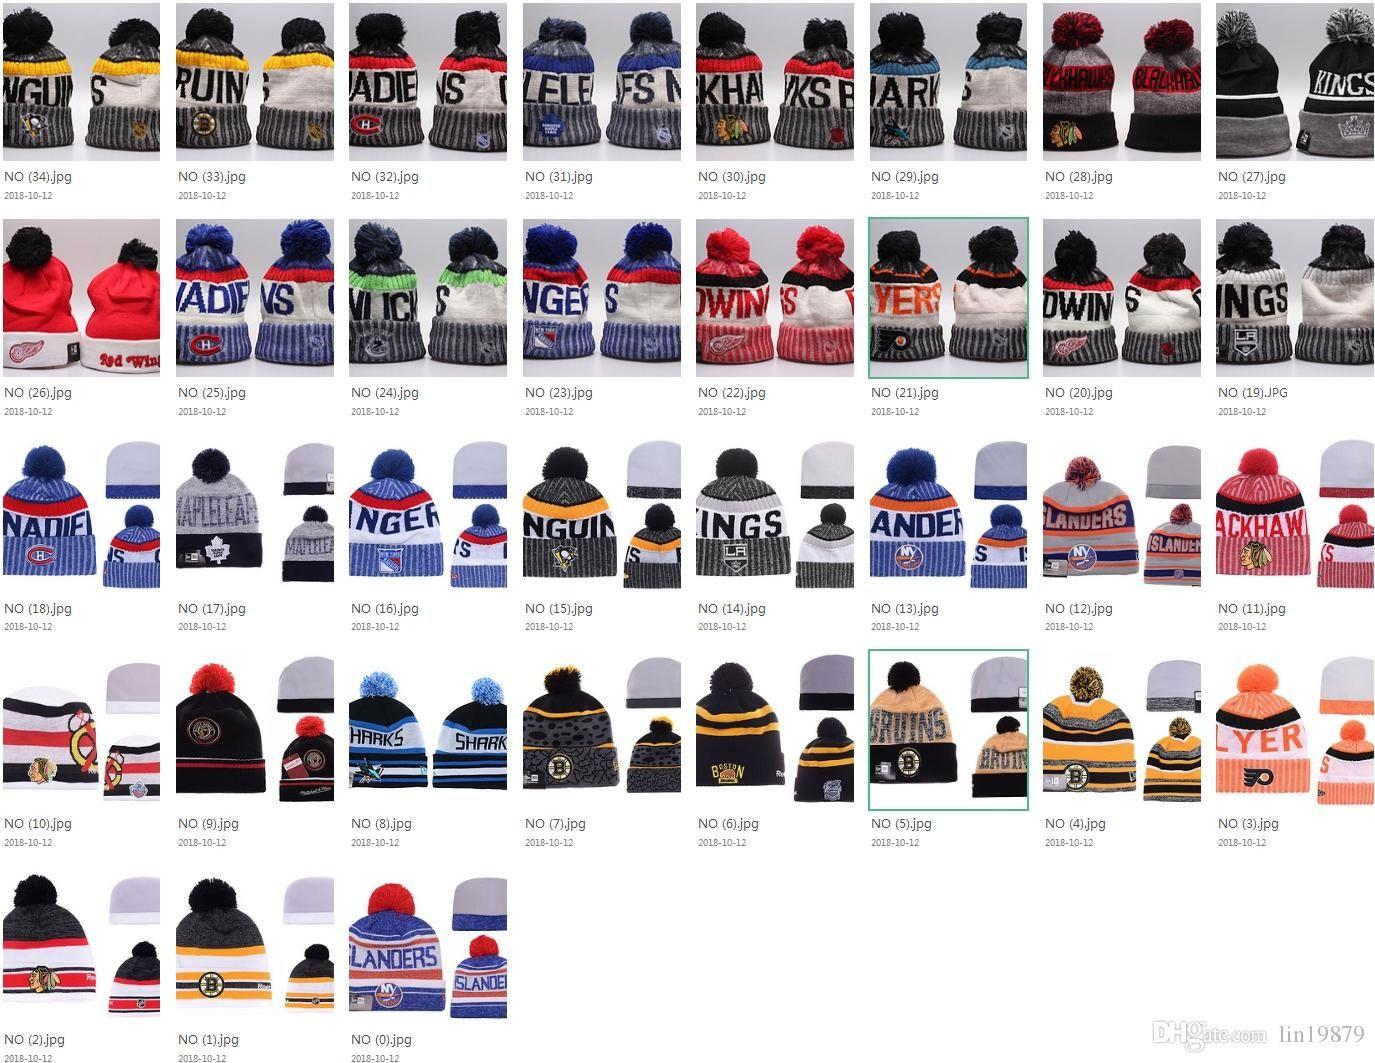 35 Styles NHL Maple Leafs Women Winter Knitted Wool Blackhawks Penguins  Flyers Sharks Beanies Unisex Casual Caps Men HipHop Beanie Warm Hats  Baseball Caps ... feff202ff